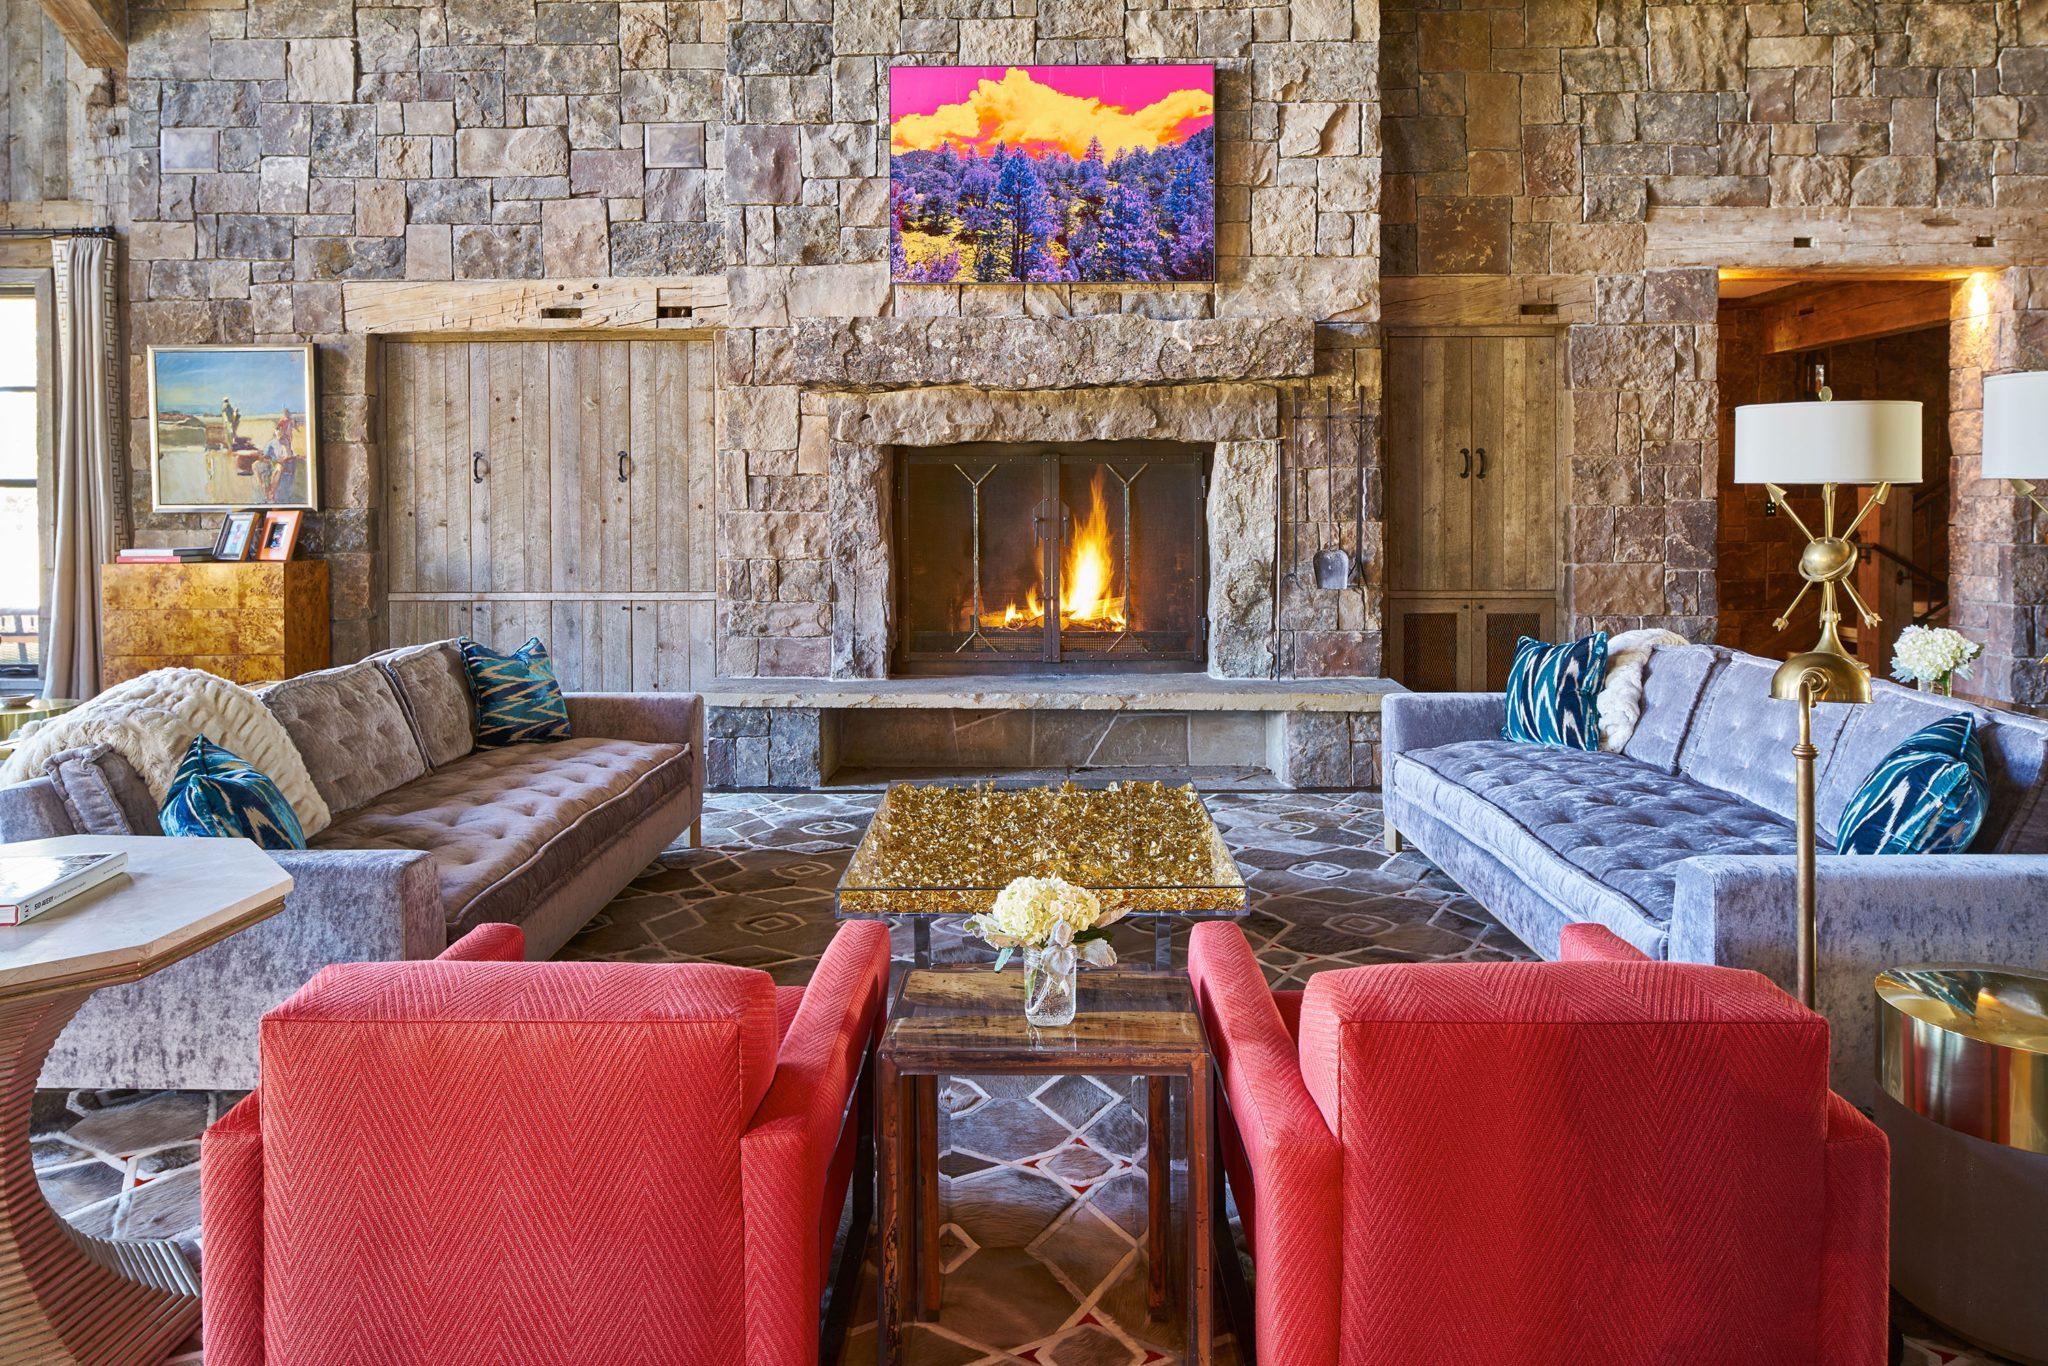 Interior design by Johnson Sokol Interior Design, featuring Da Bomb sofas by Richard Shemtov